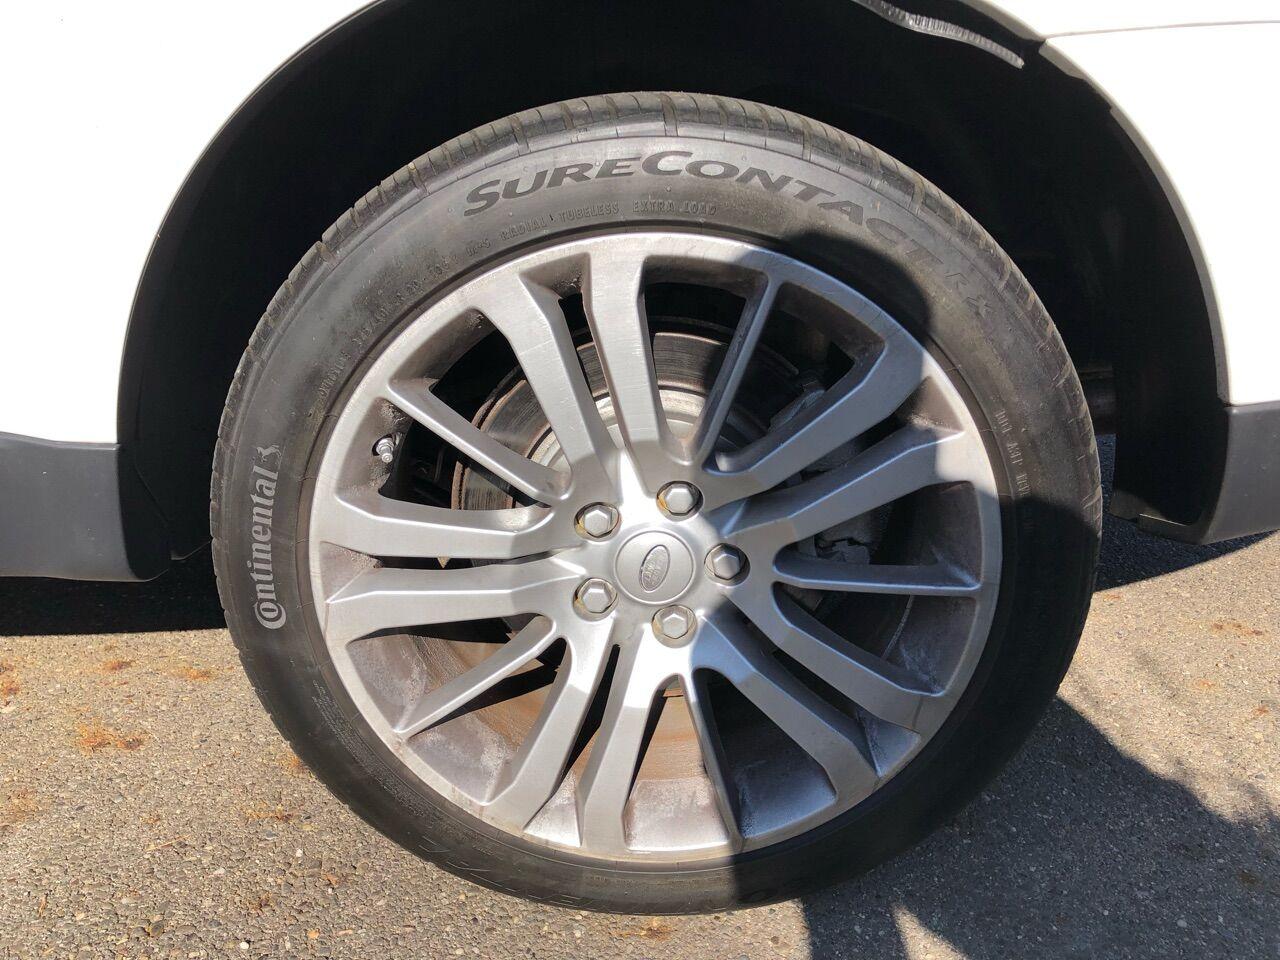 2011 Land Rover Range Rover Sport Sport Utility